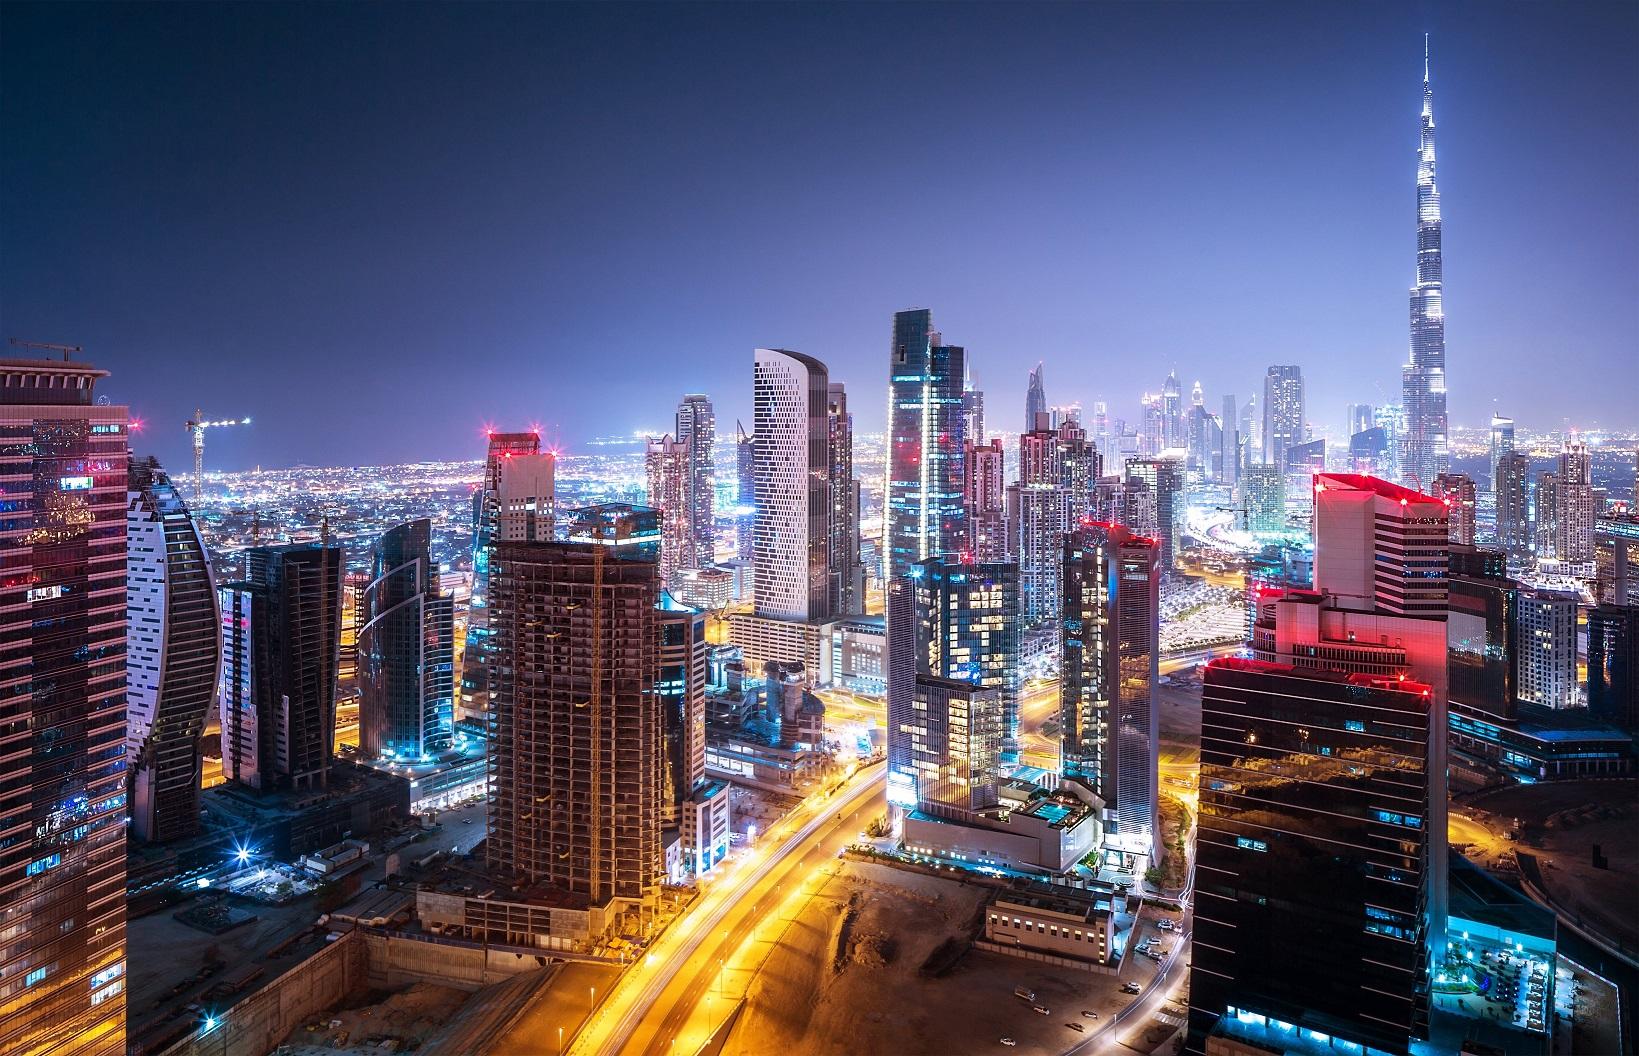 .33 billion dirhams of Dubai real estate transactions in a week